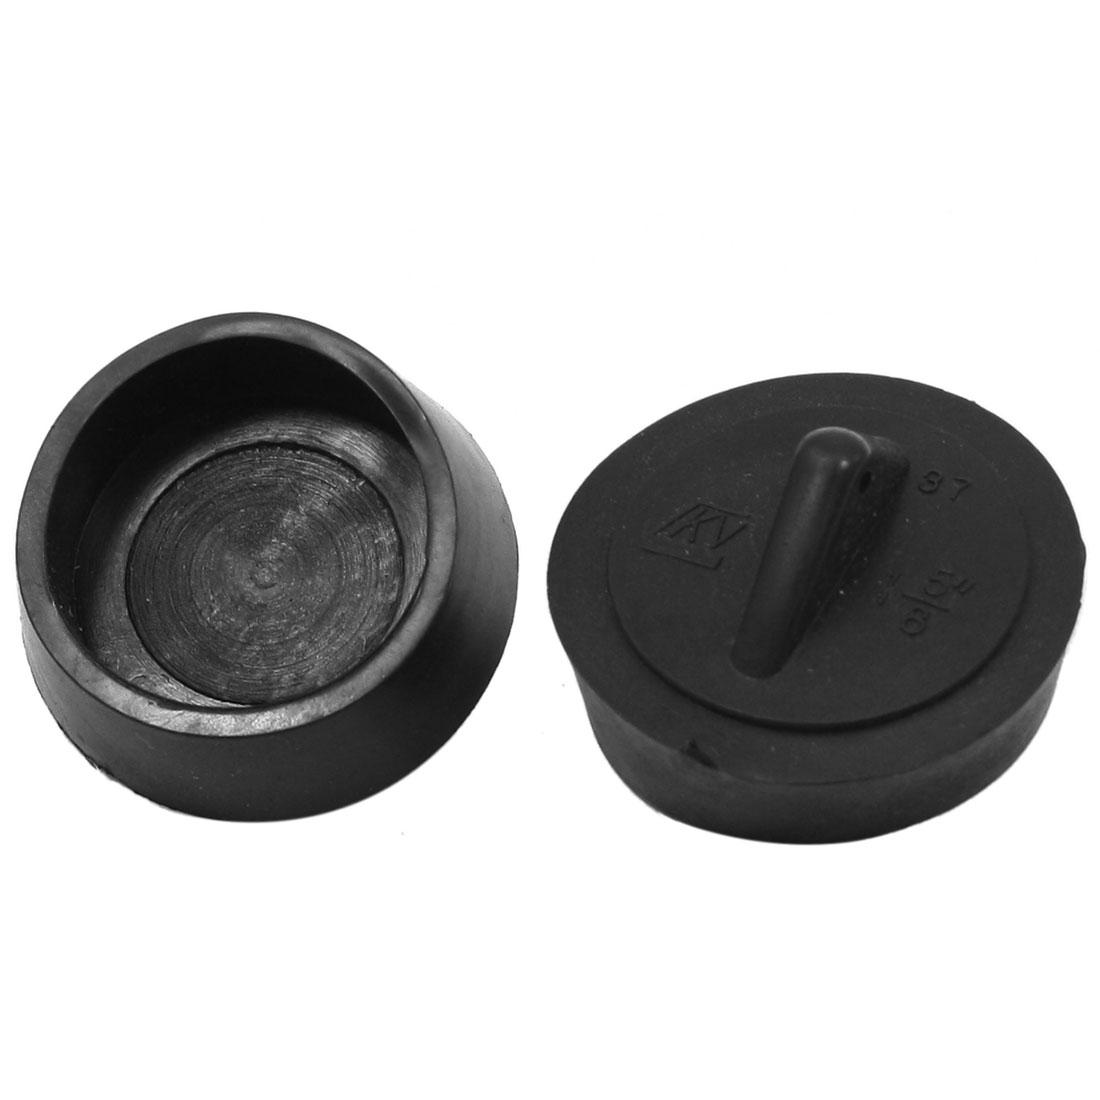 "1 5/8"" Diameter Water Sink Drainer Black Rubber Disposal Stopper 2 Pcs"